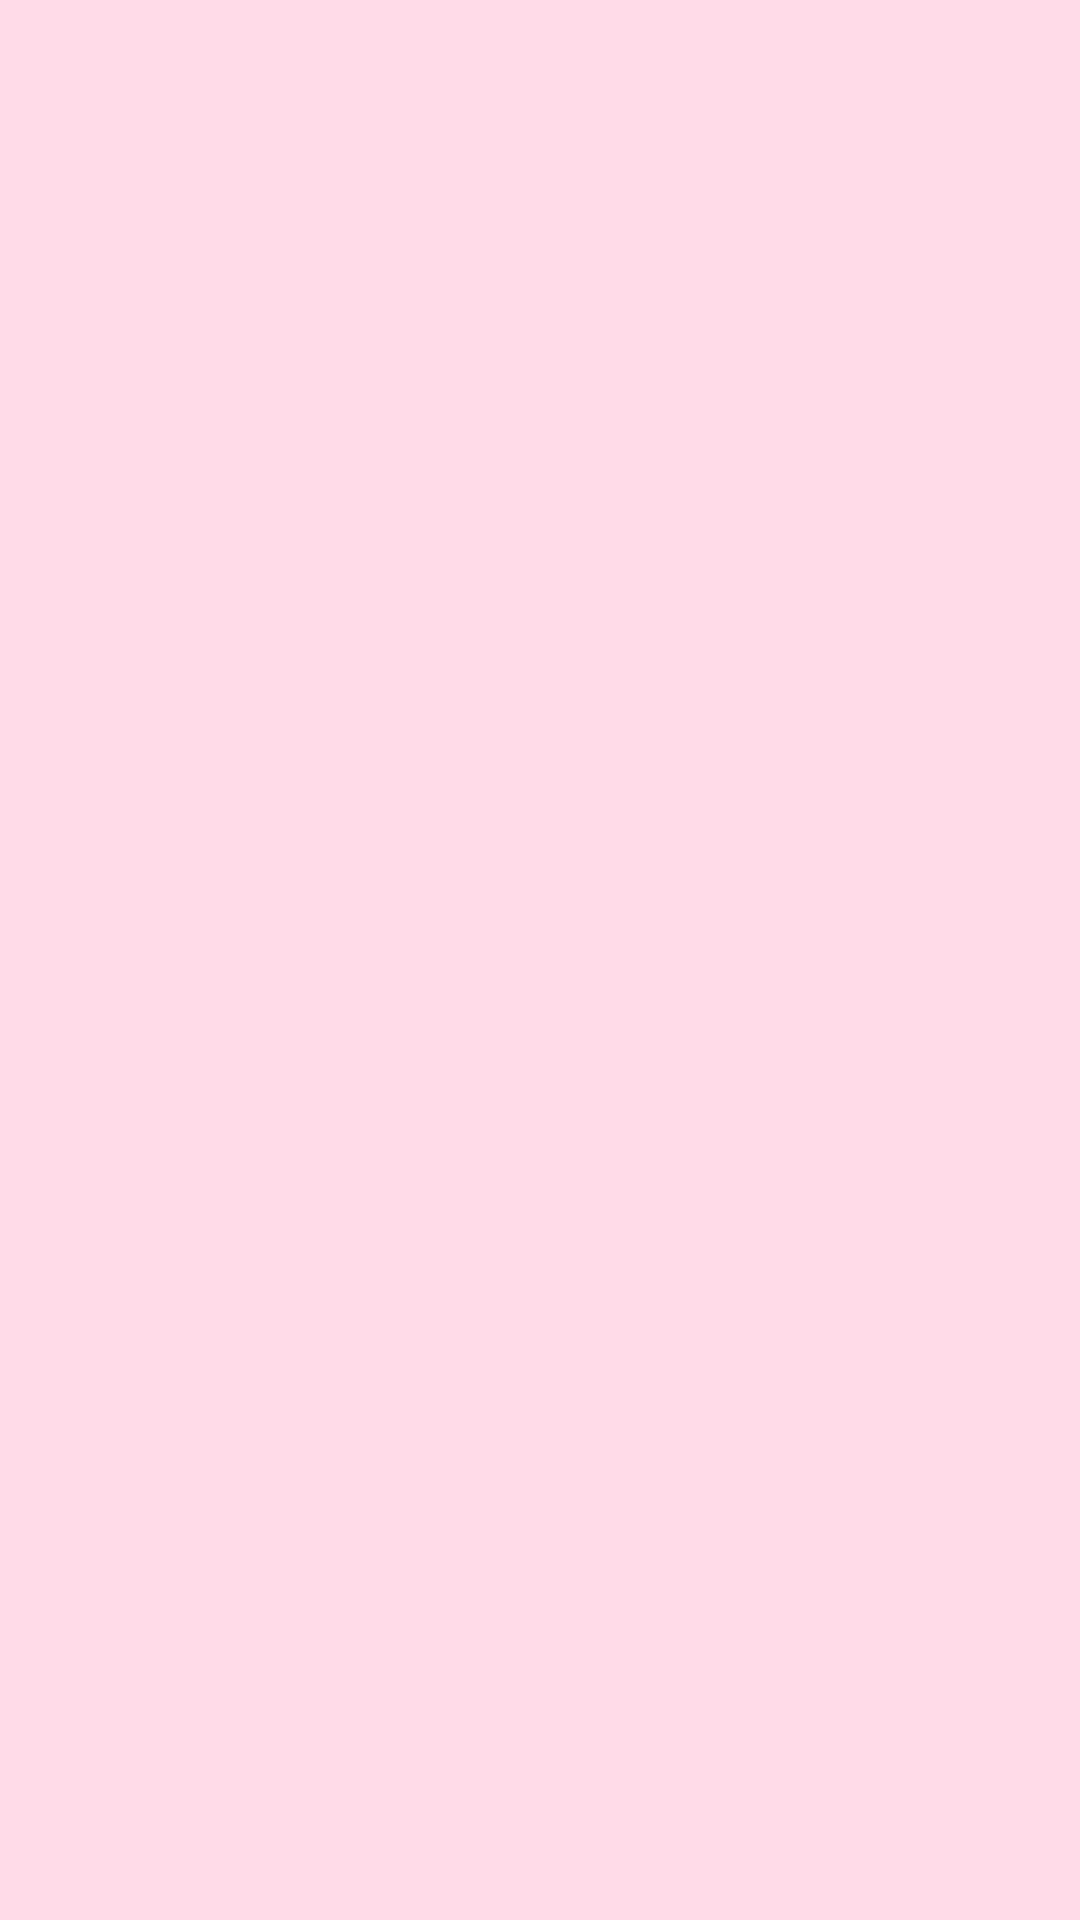 wallpaper baby pink | animaxwallpaper